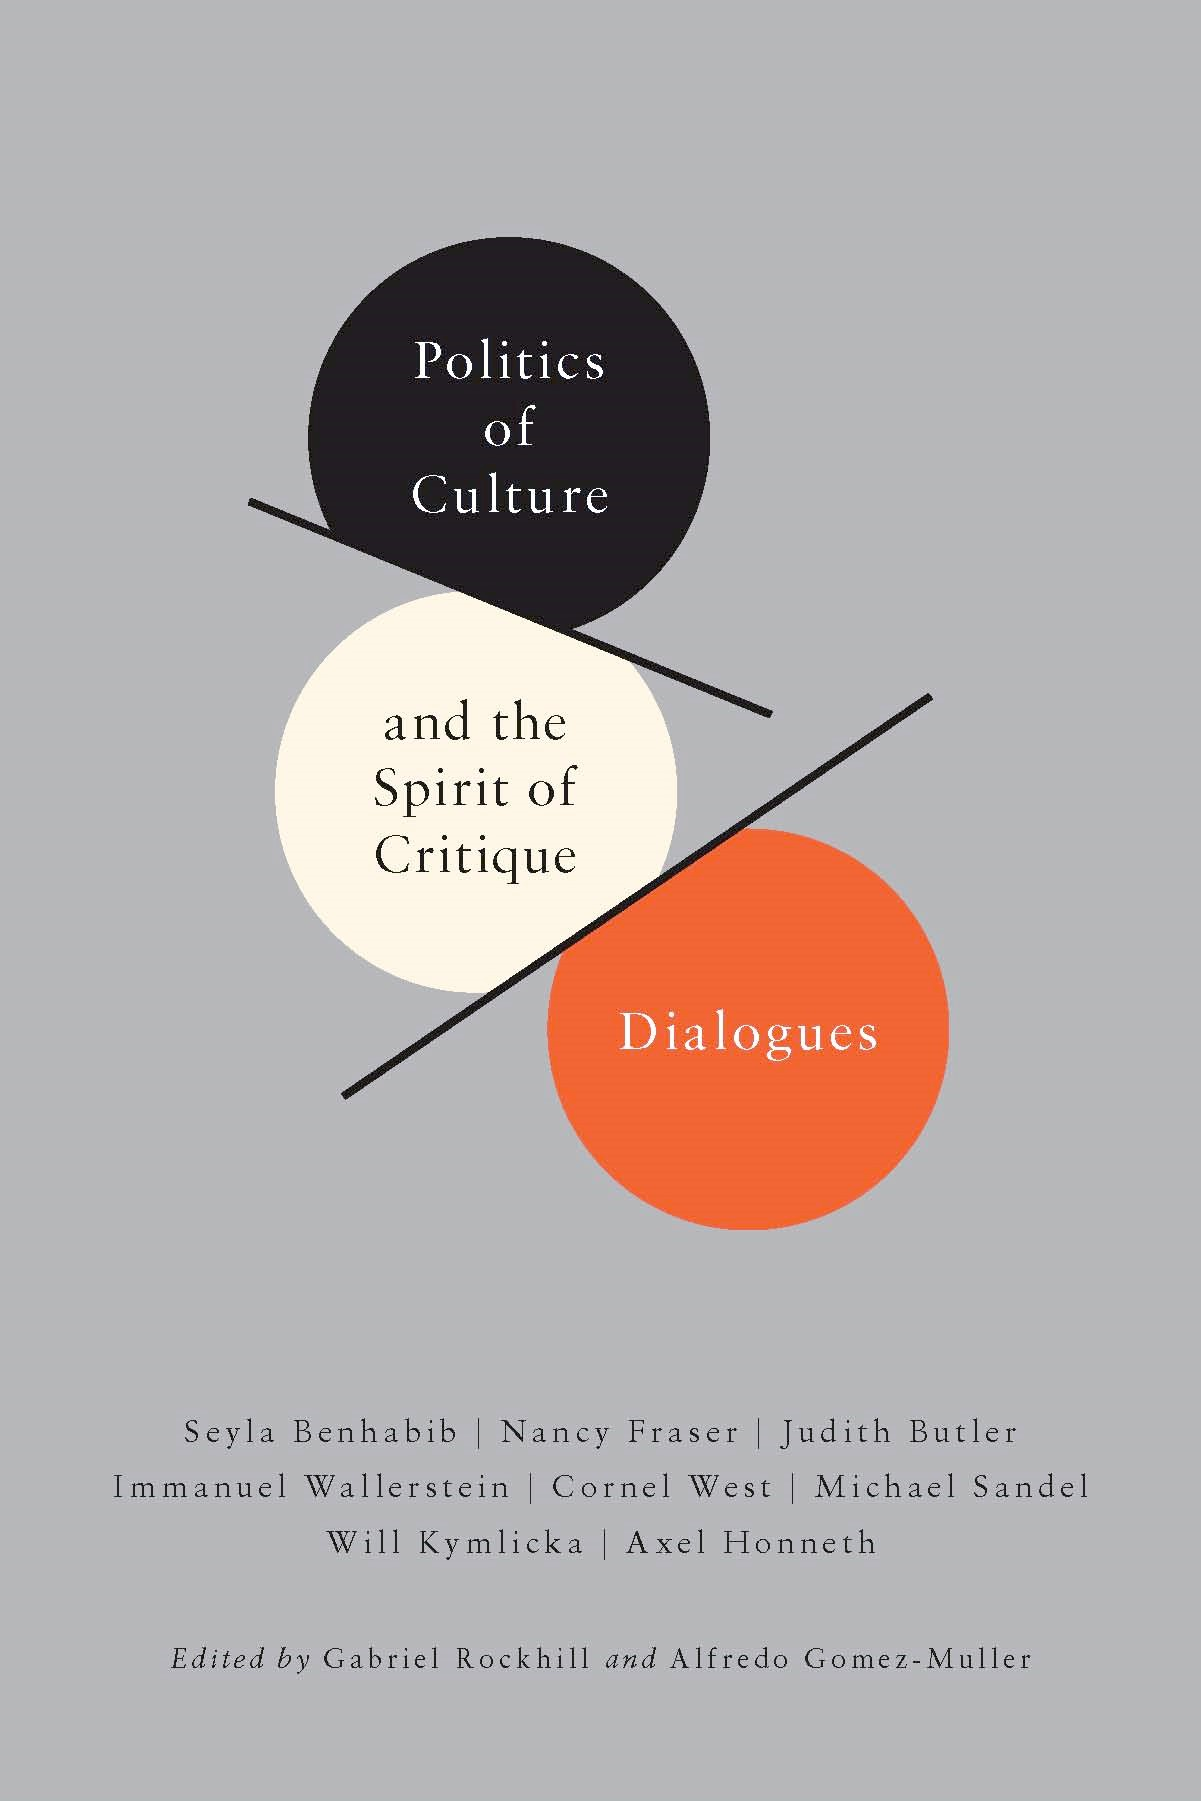 Abbildung von Rockhill / Gomez-Muller | Politics of Culture and the Spirit of Critique | 2011